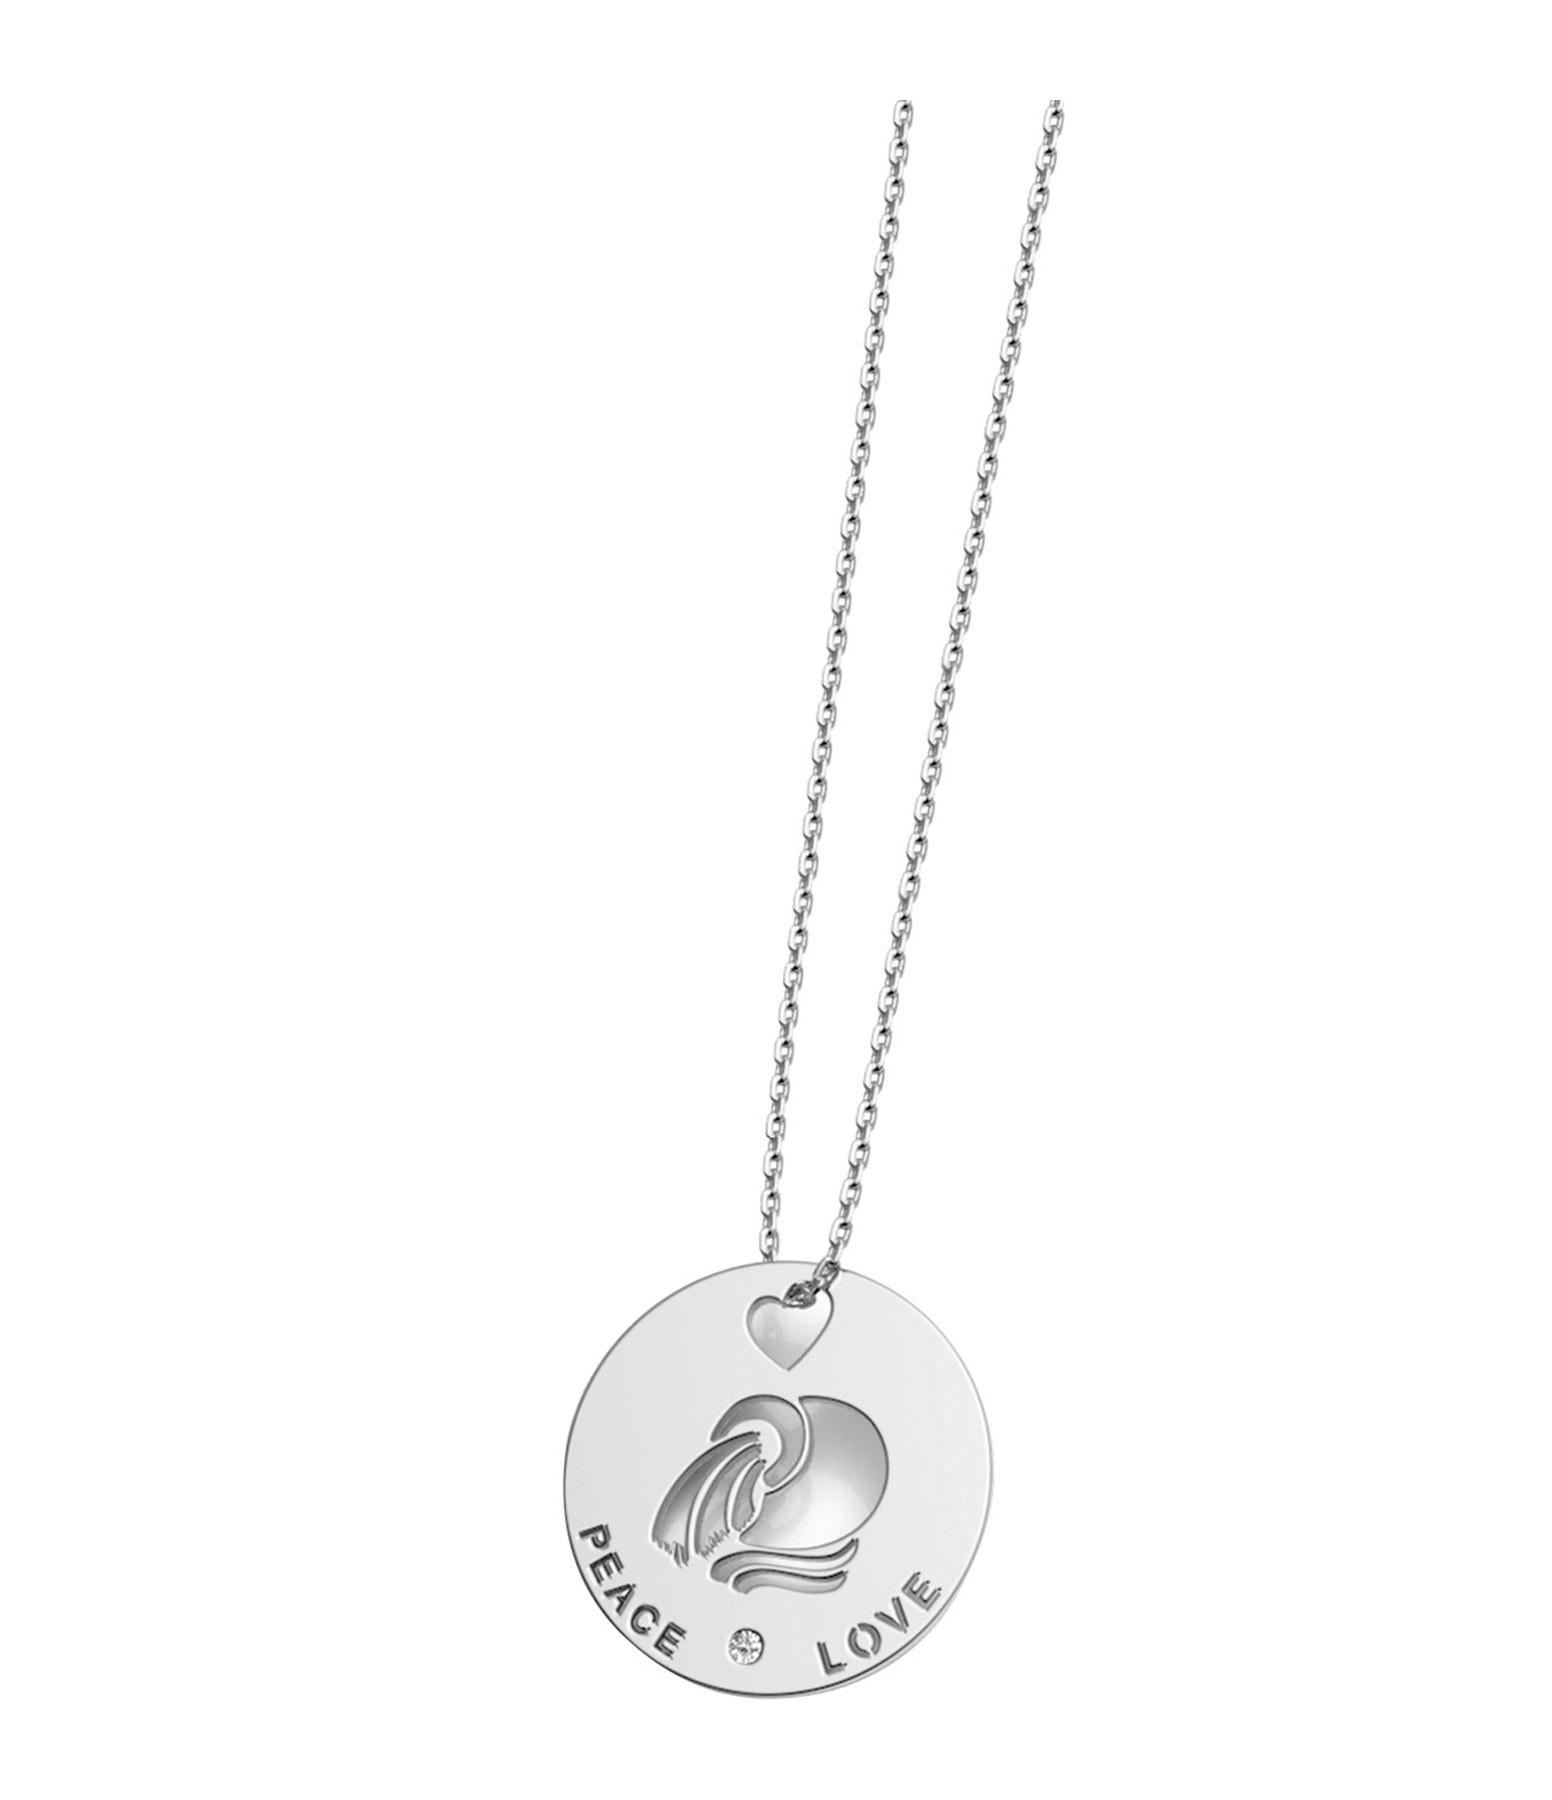 NAVA JOAILLERIE - Collier Horosco-Rock Verseau Diamants Or